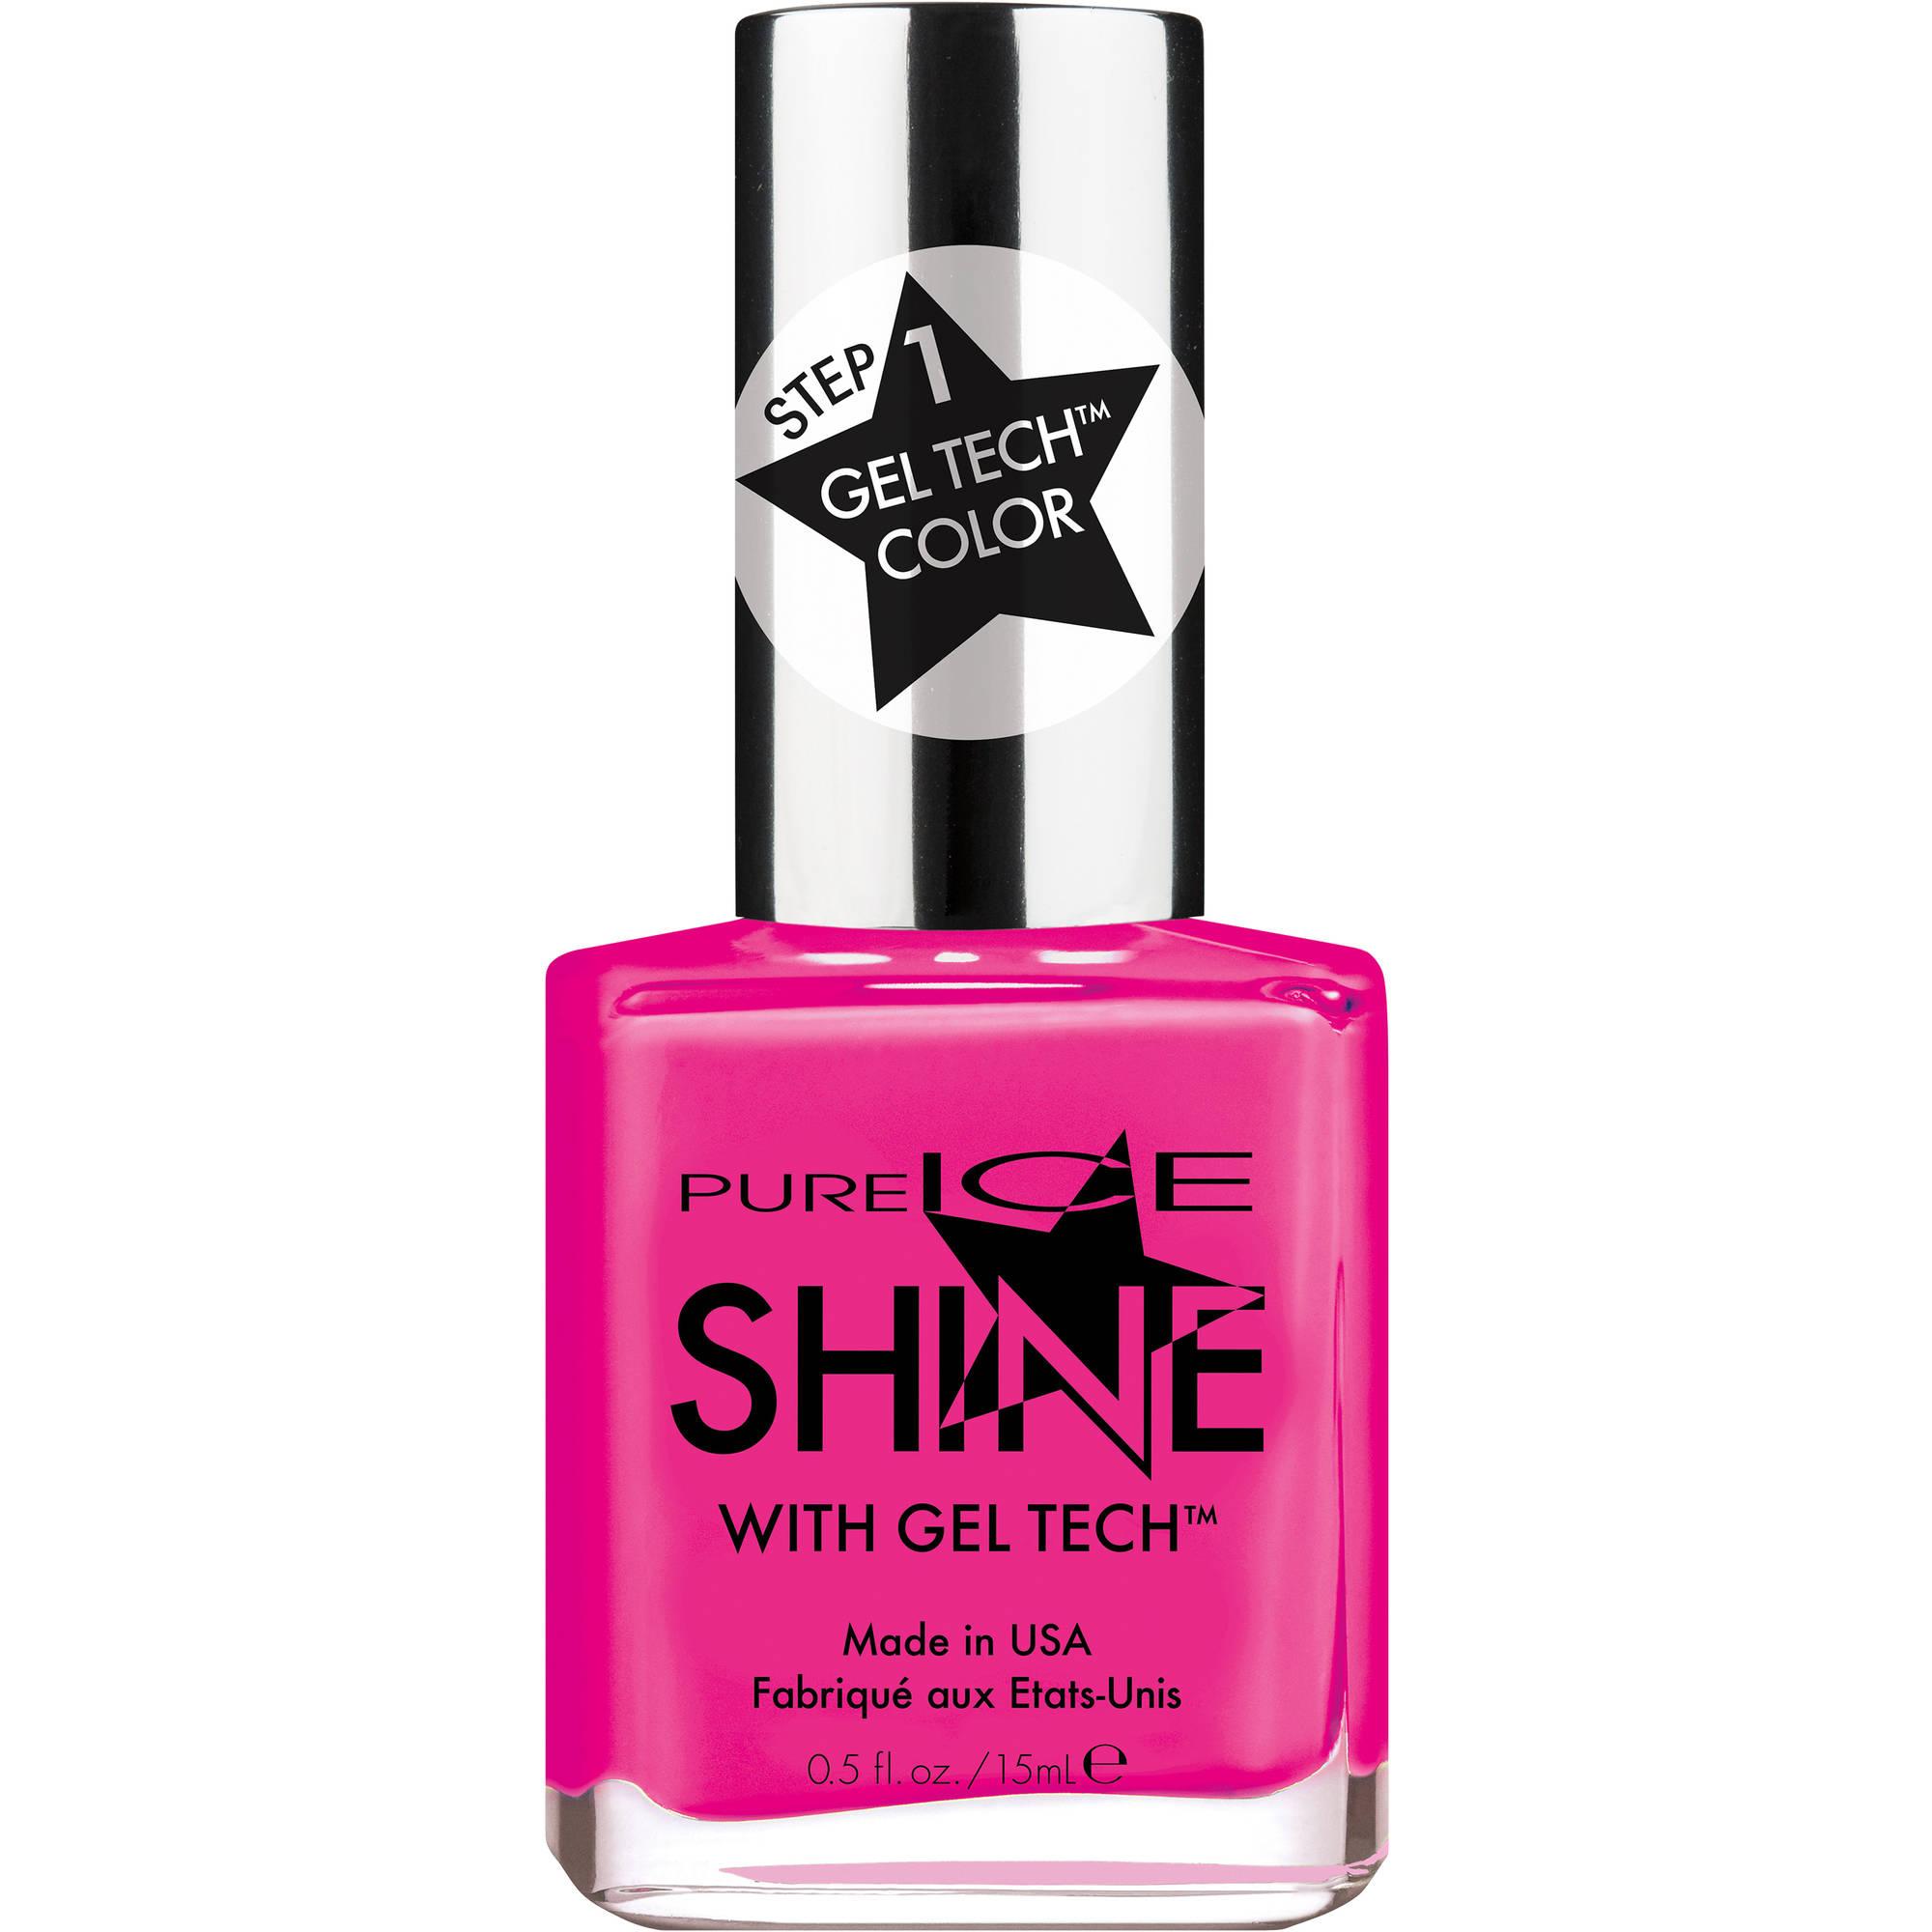 Pure Ice Shine with Gel Tech Nail Polish, Crop Top, 0.5 fl oz